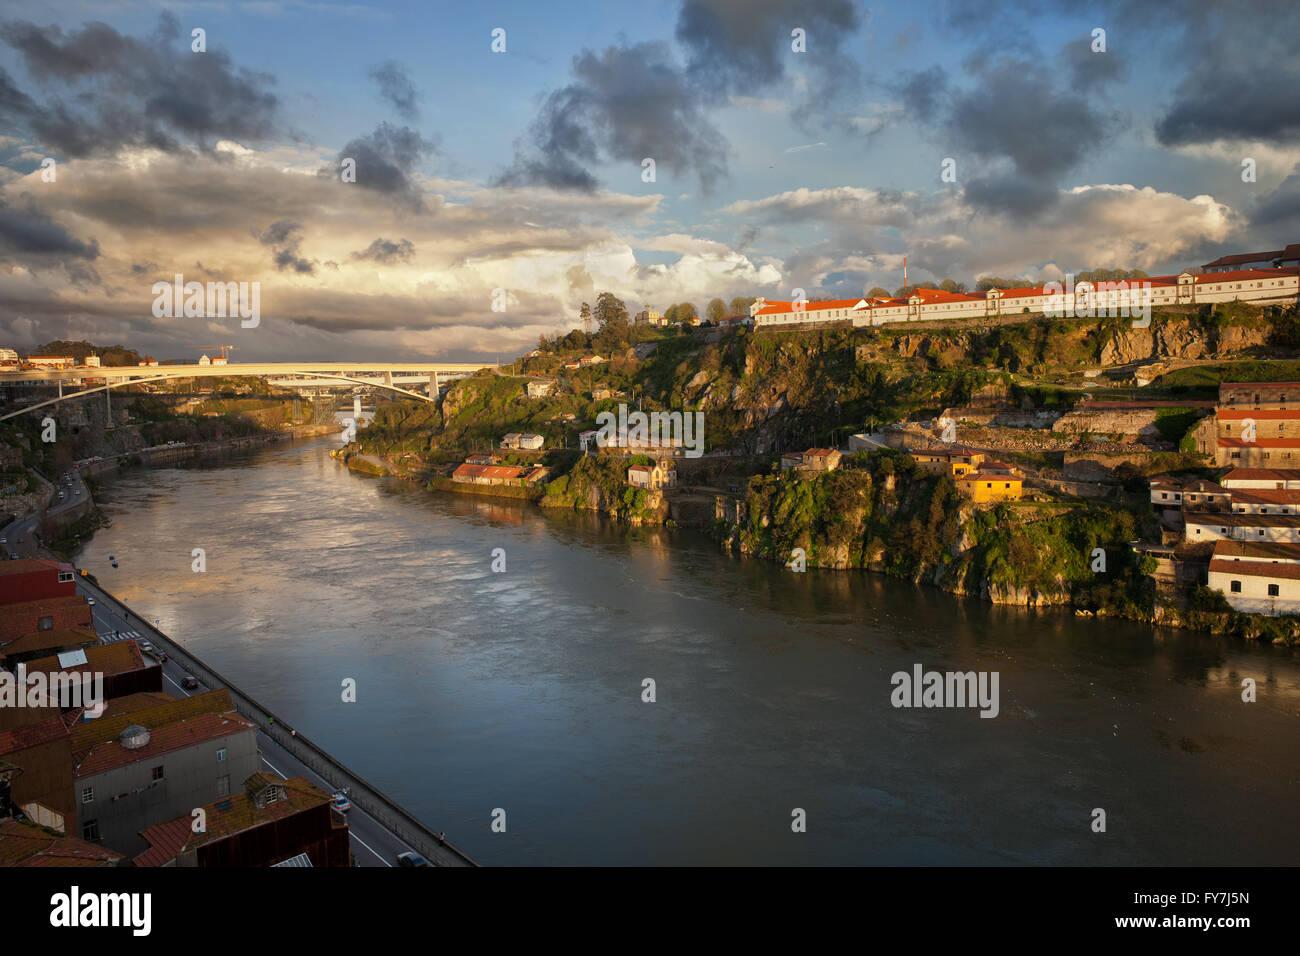 Sunset at Douro River between Vila Nova de Gaia and Porto in Portugal - Stock Image